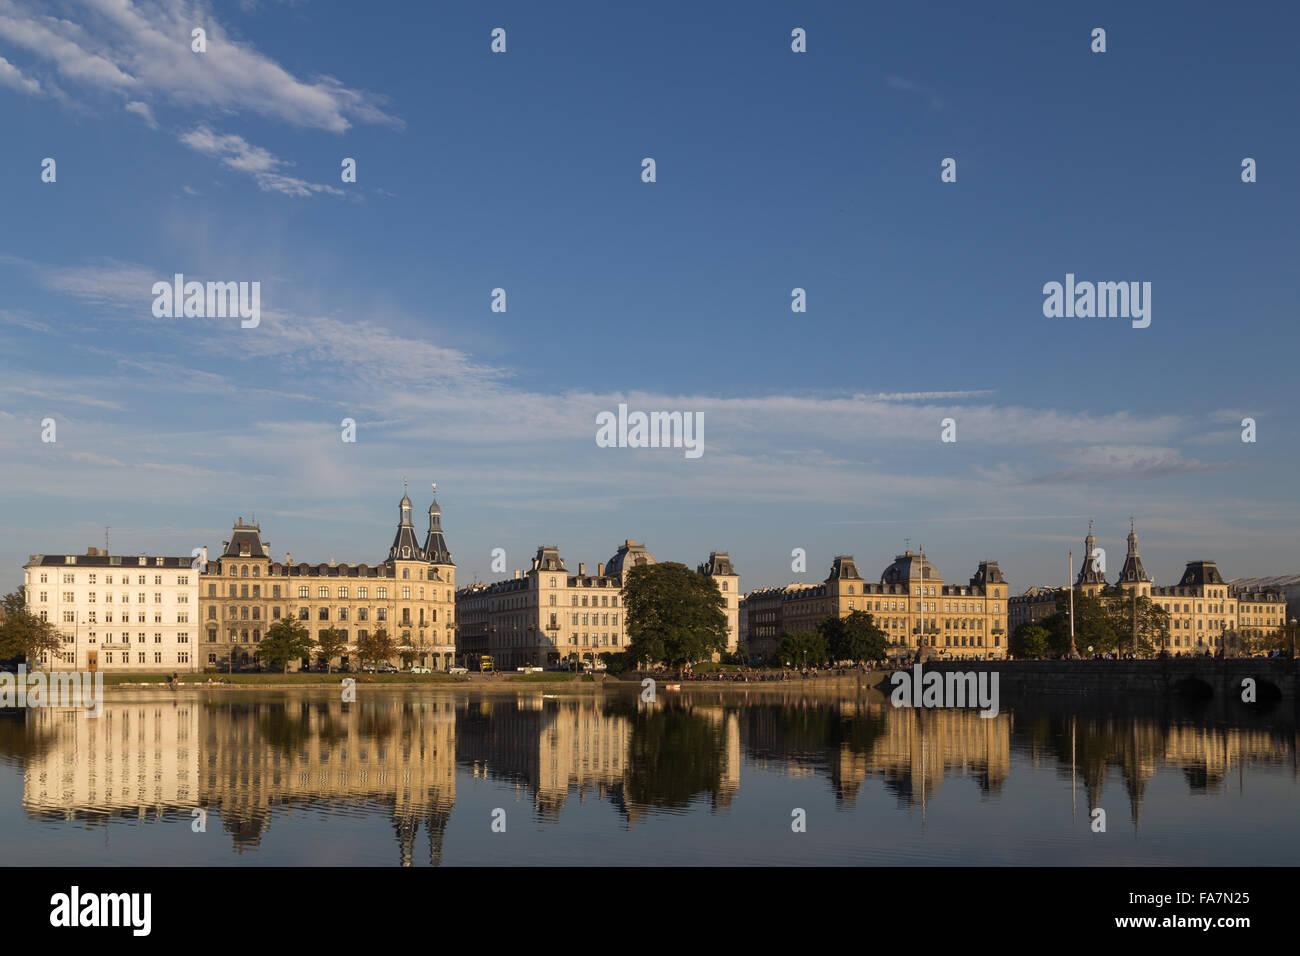 View over Sortedams Lake in Copenhagen, Denmark. - Stock Image